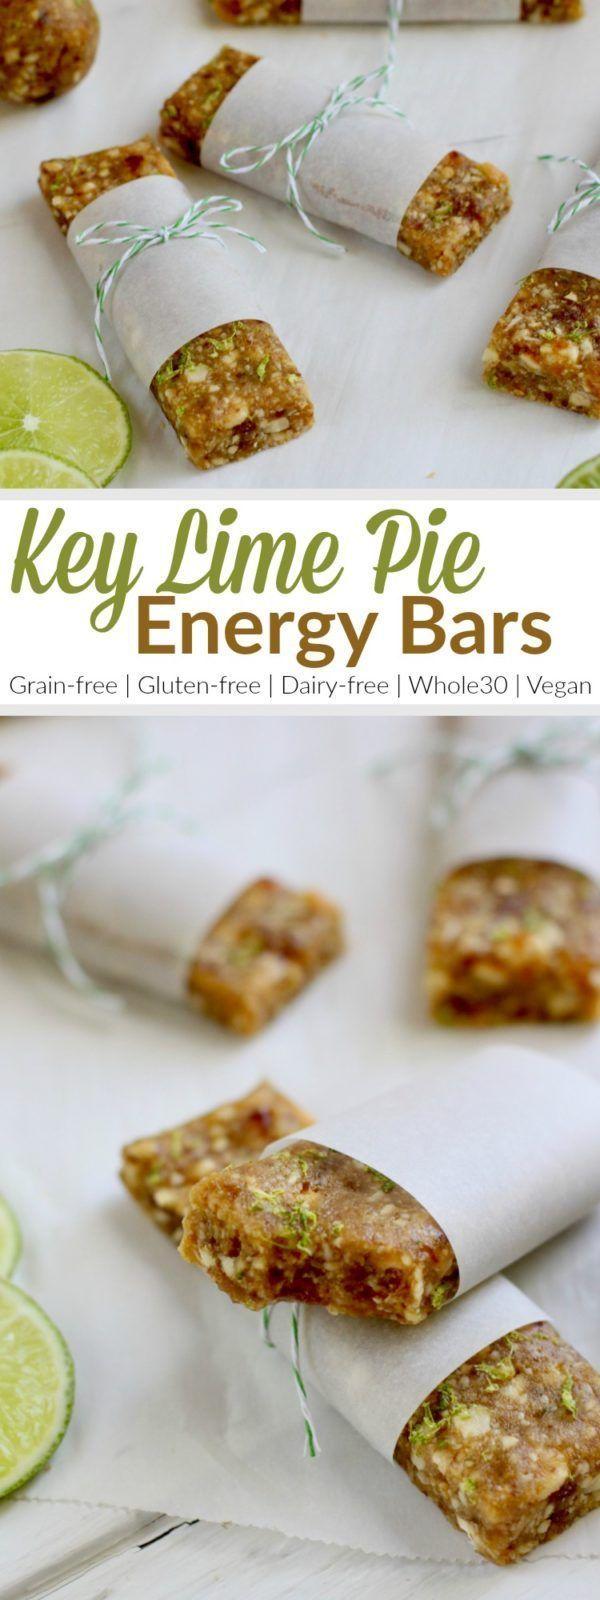 Key Lime Pie Energy Bars | Paleo energy bars | Gluten-free energy bars | Dairy-free energy bars | Vegan energy bars || The Real Food Dietitians #homemadelarabar #energybars #healthysnack